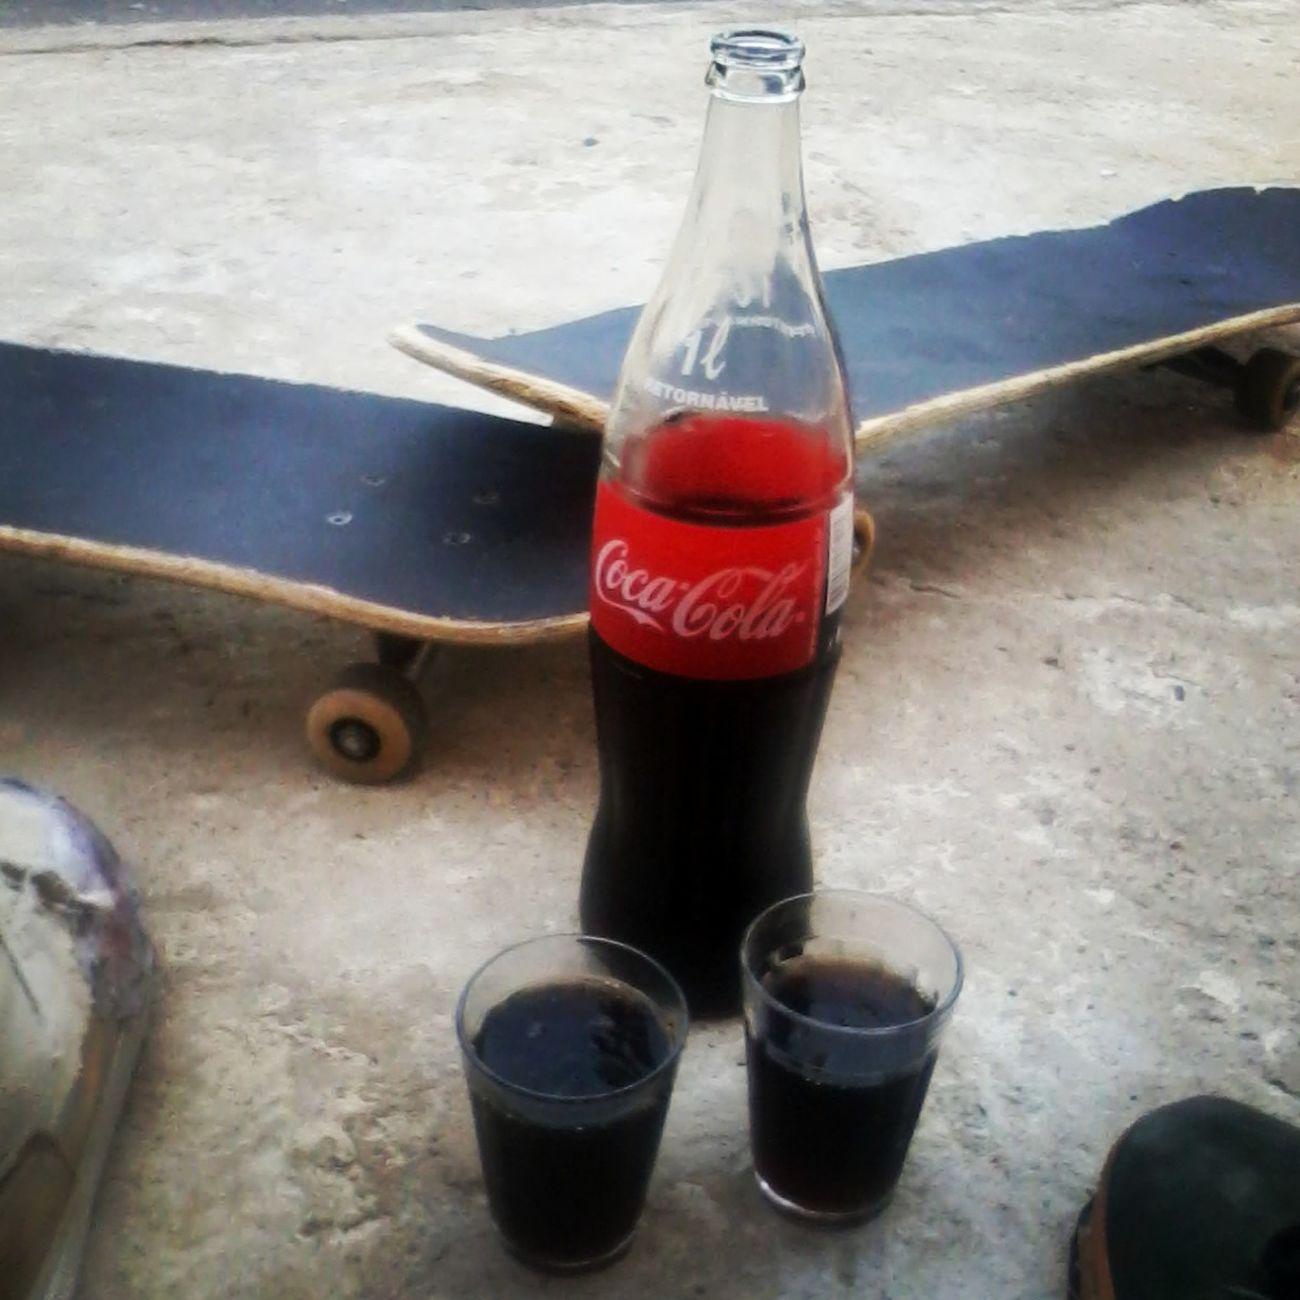 Sessão,Coca,Skateboarding ♥... Cocacola, Beach, Susan, Skateboarding